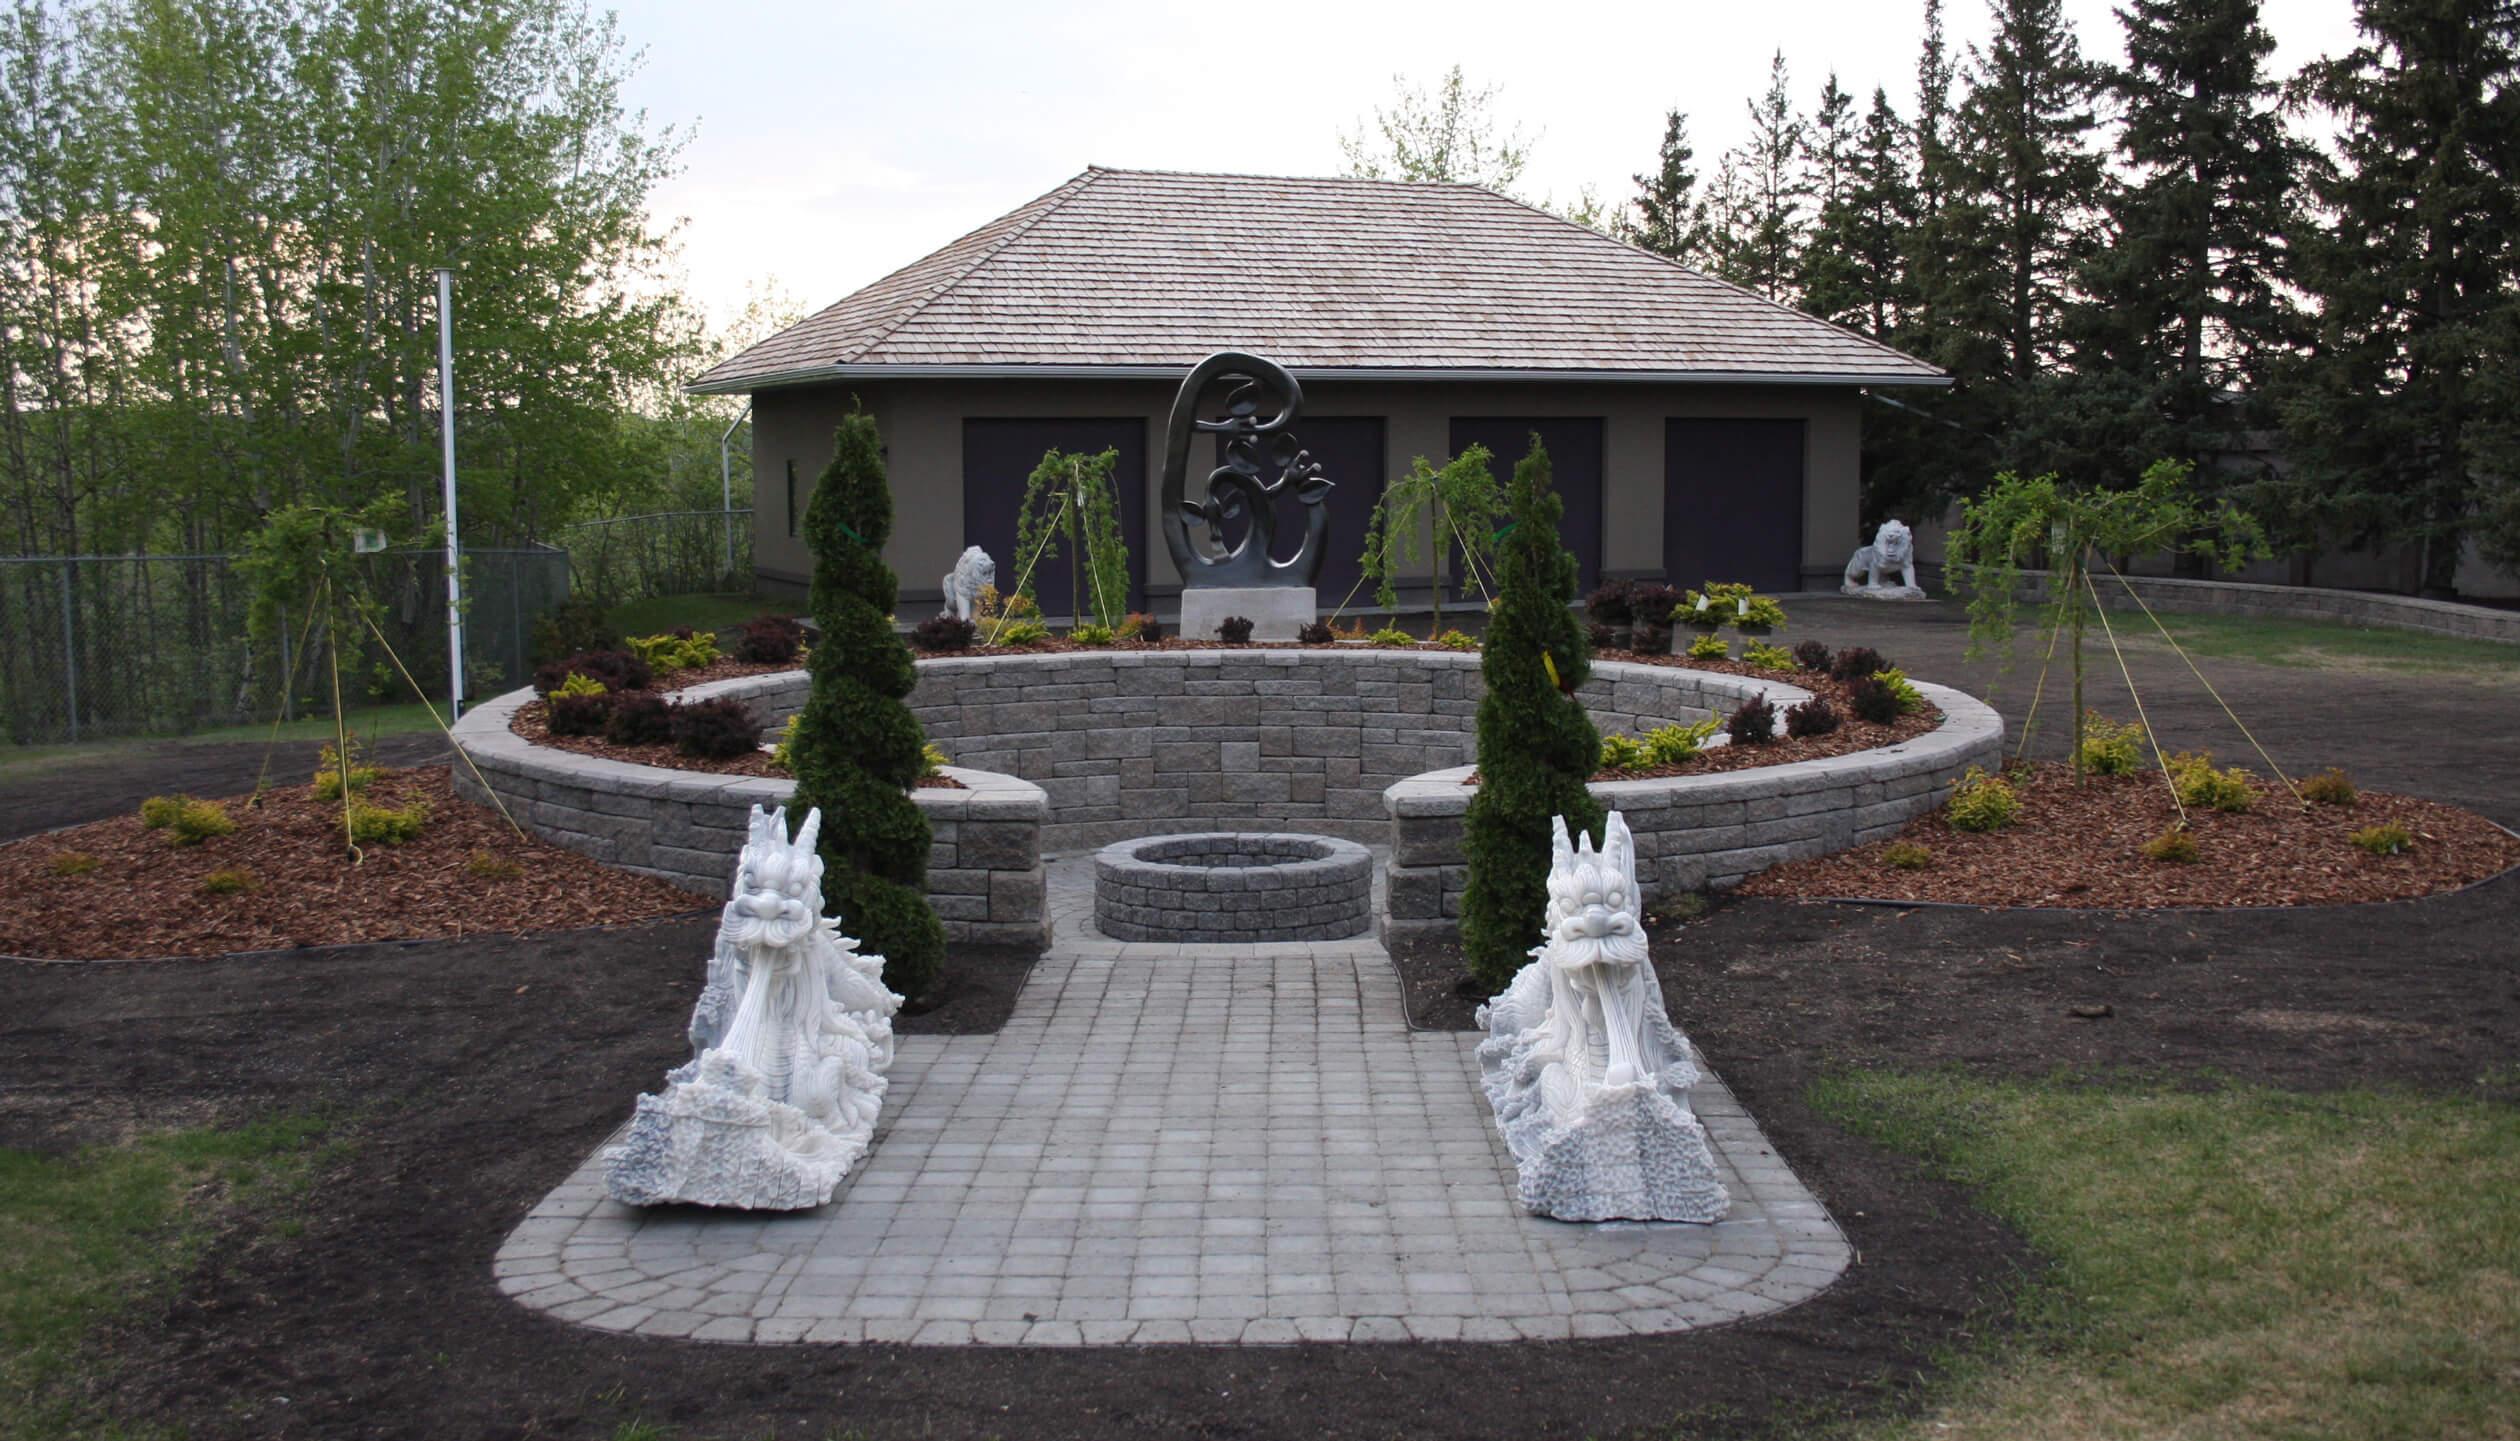 edmonton home landscaping